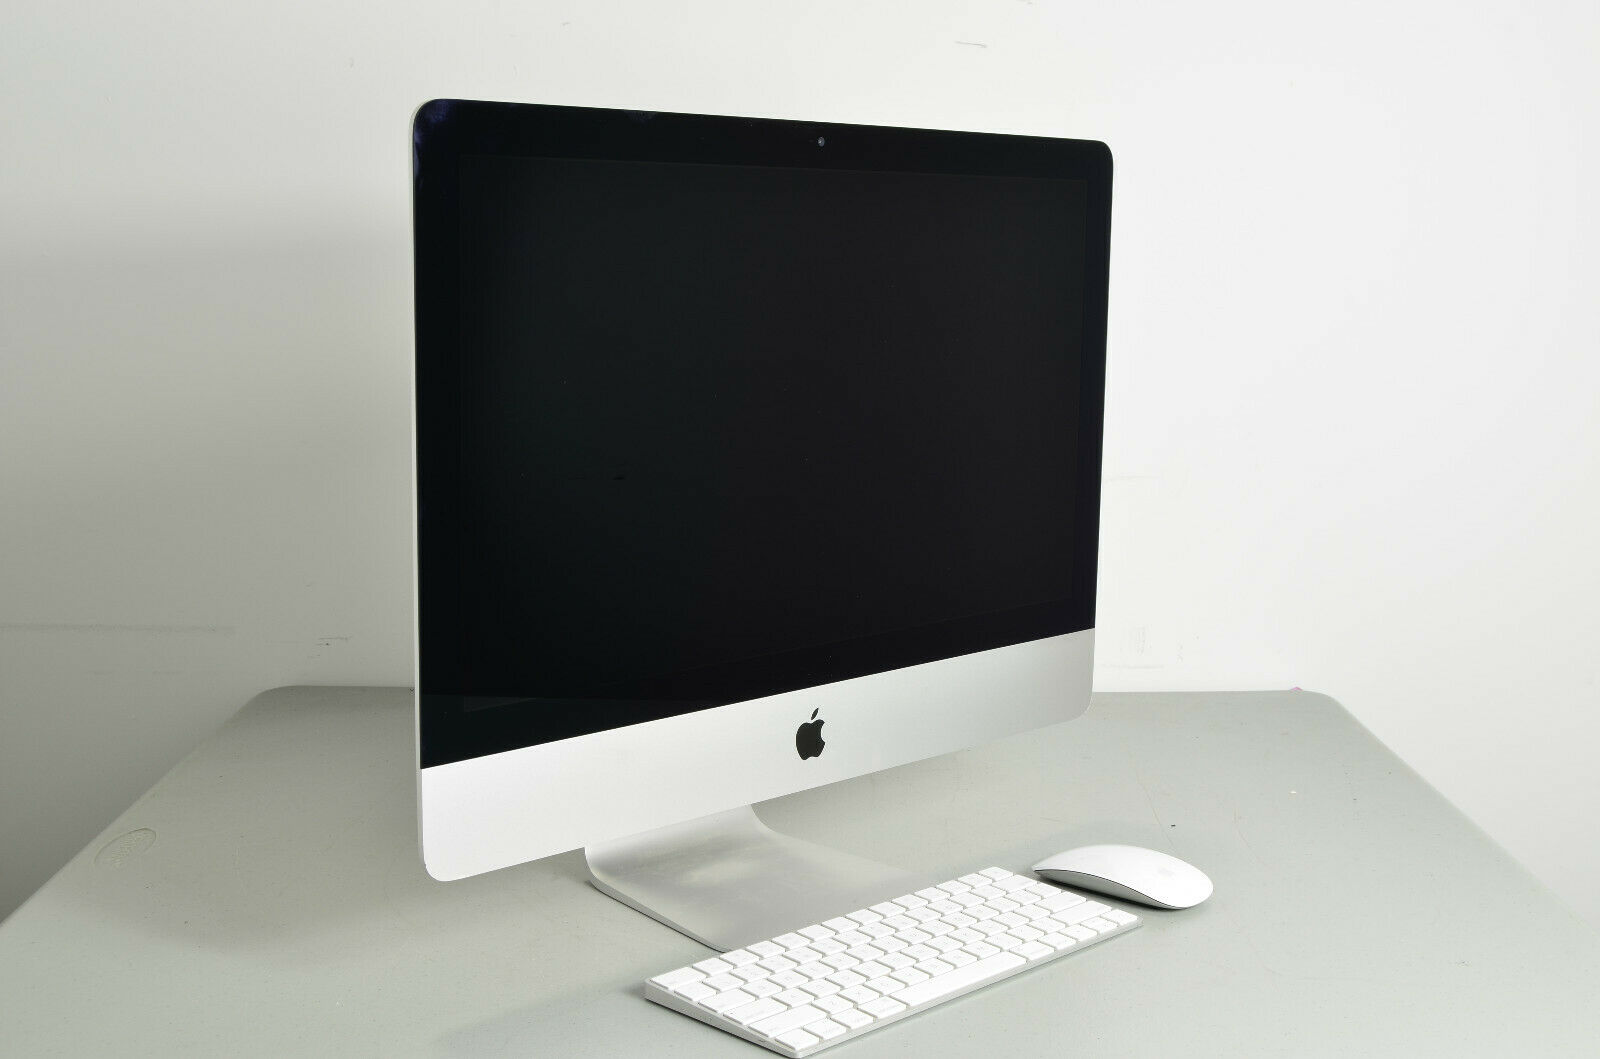 Apple iMac Core i7-7700 3.6GHz 16GB 1TB 21.5